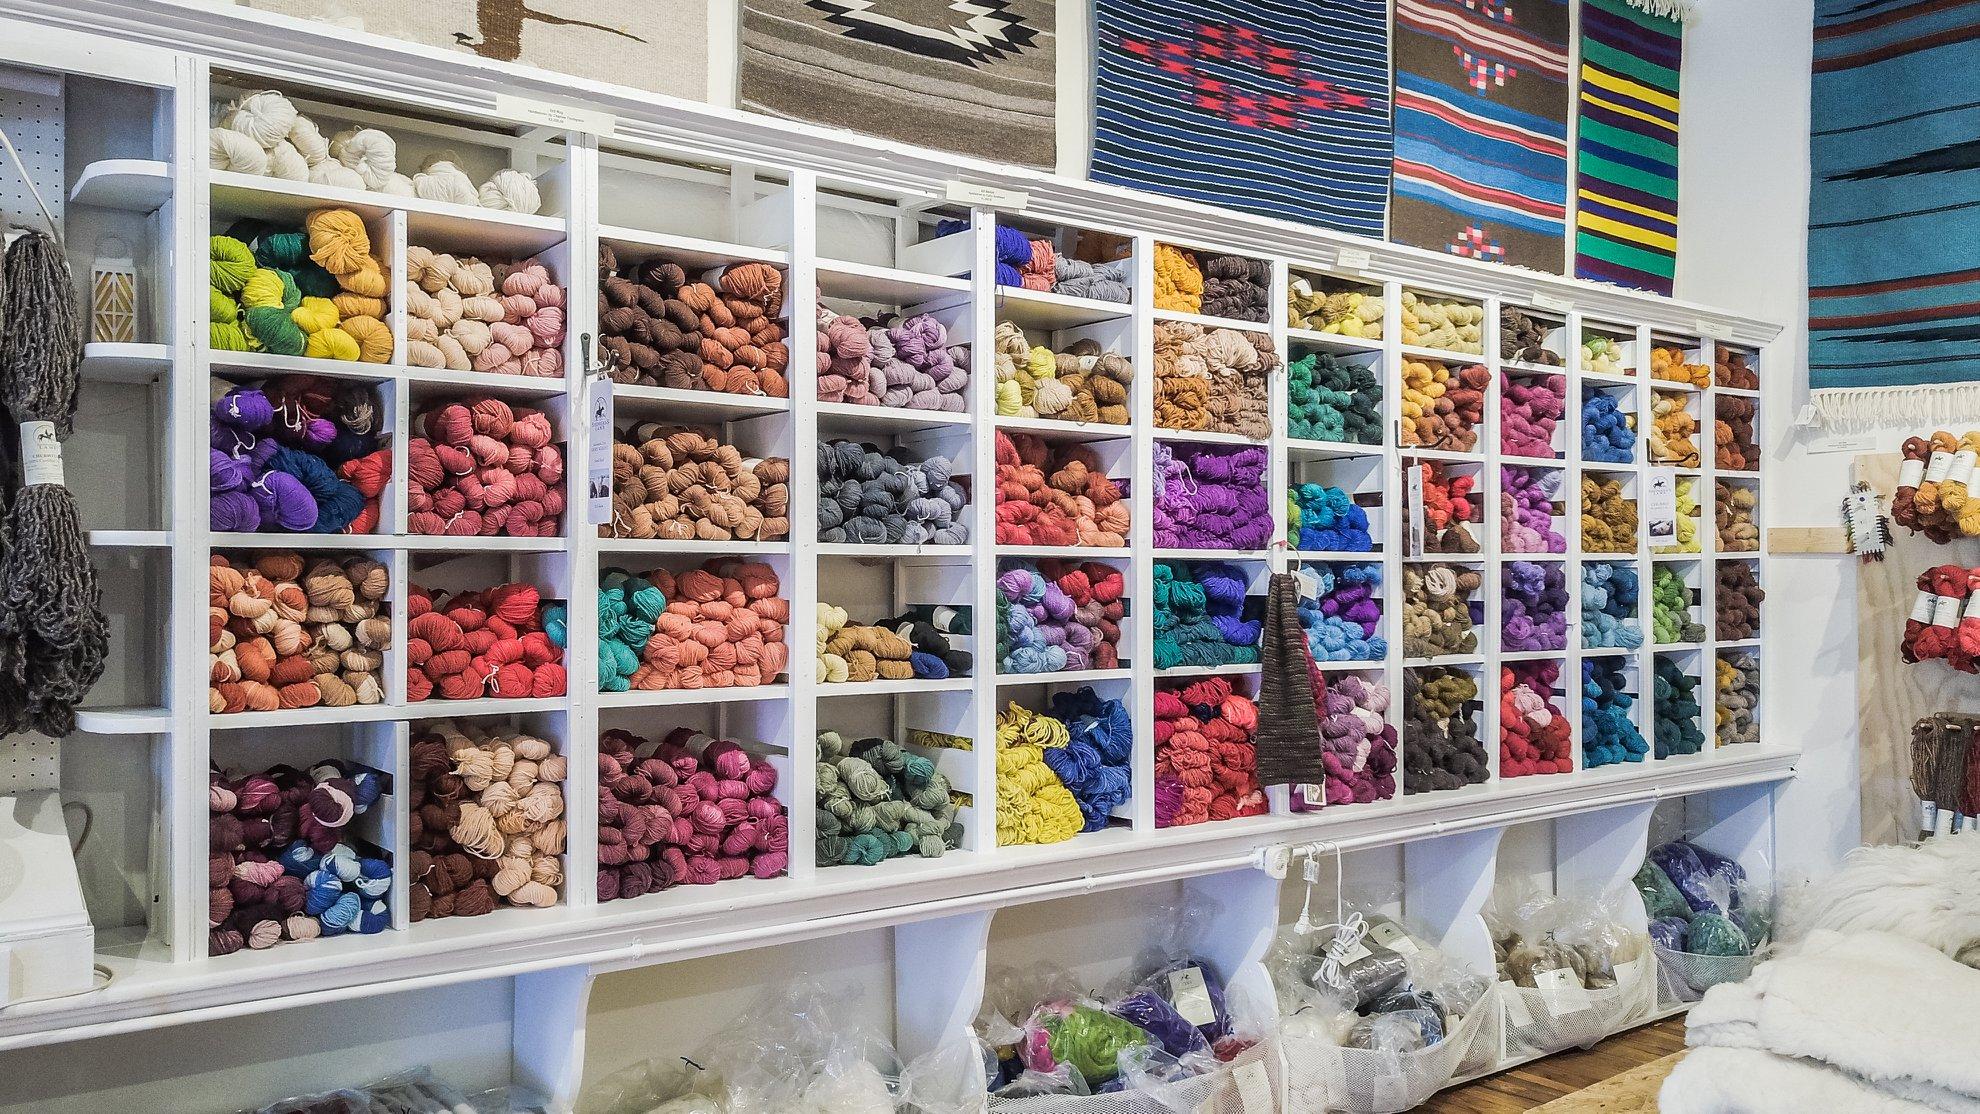 Yarns and weavings for sale at Tierra Wools. Photo by Dan Monaghan